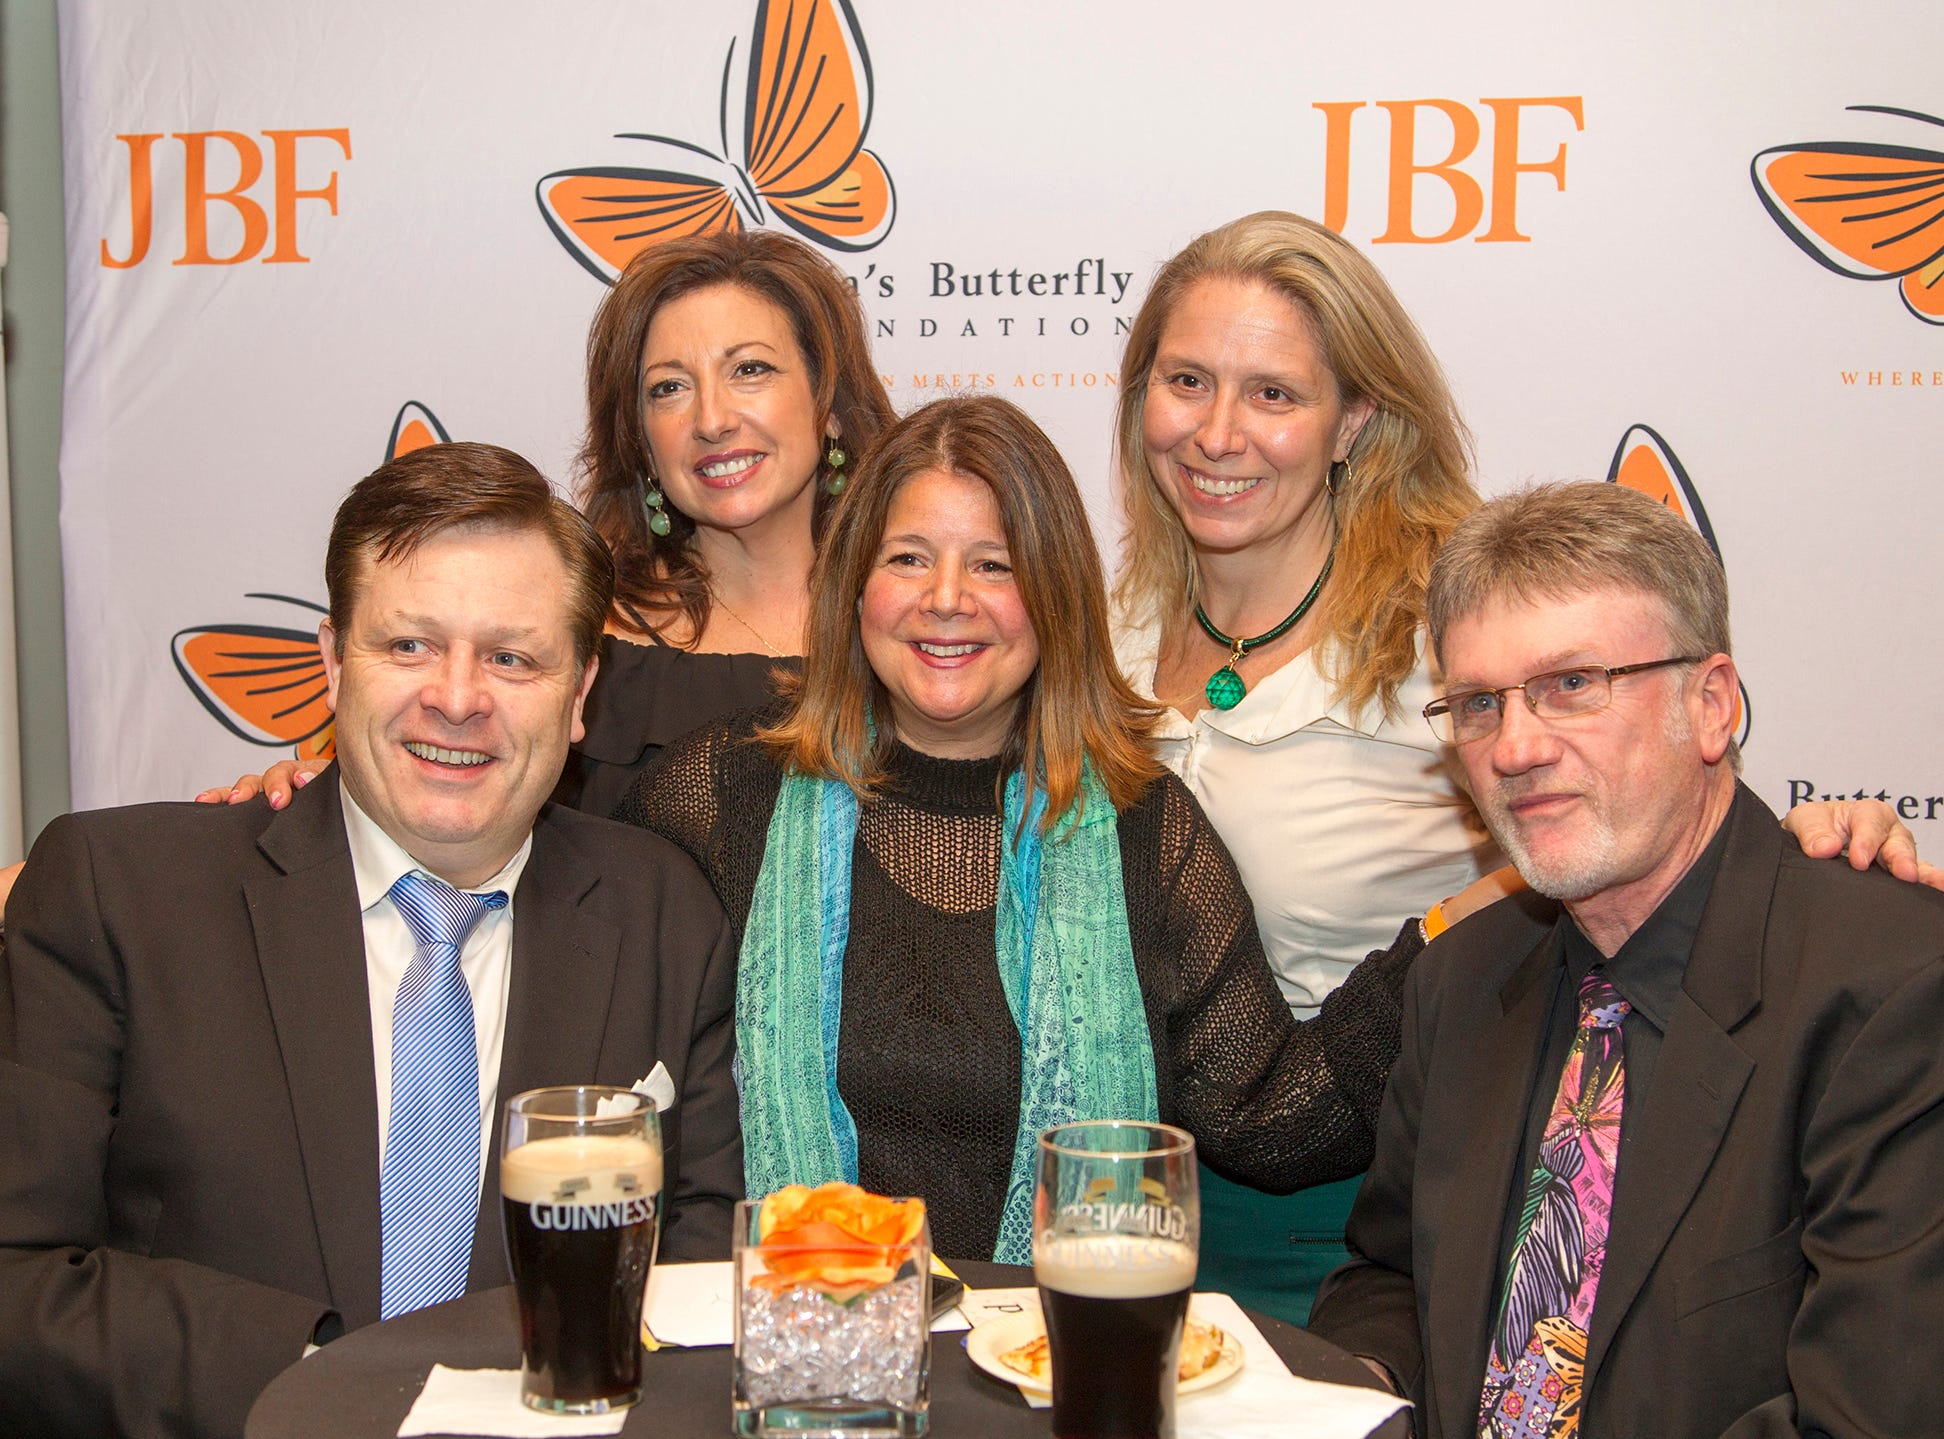 Anthony Kearns, Kathleen Williams, Lisa Kirkwod, Lisa Roman, David George. Anthony Kearns benefit concert to benefit Julia's Butterfly Foundation at West Side Presbyterian Church in Ridgewood. 3/23/2019